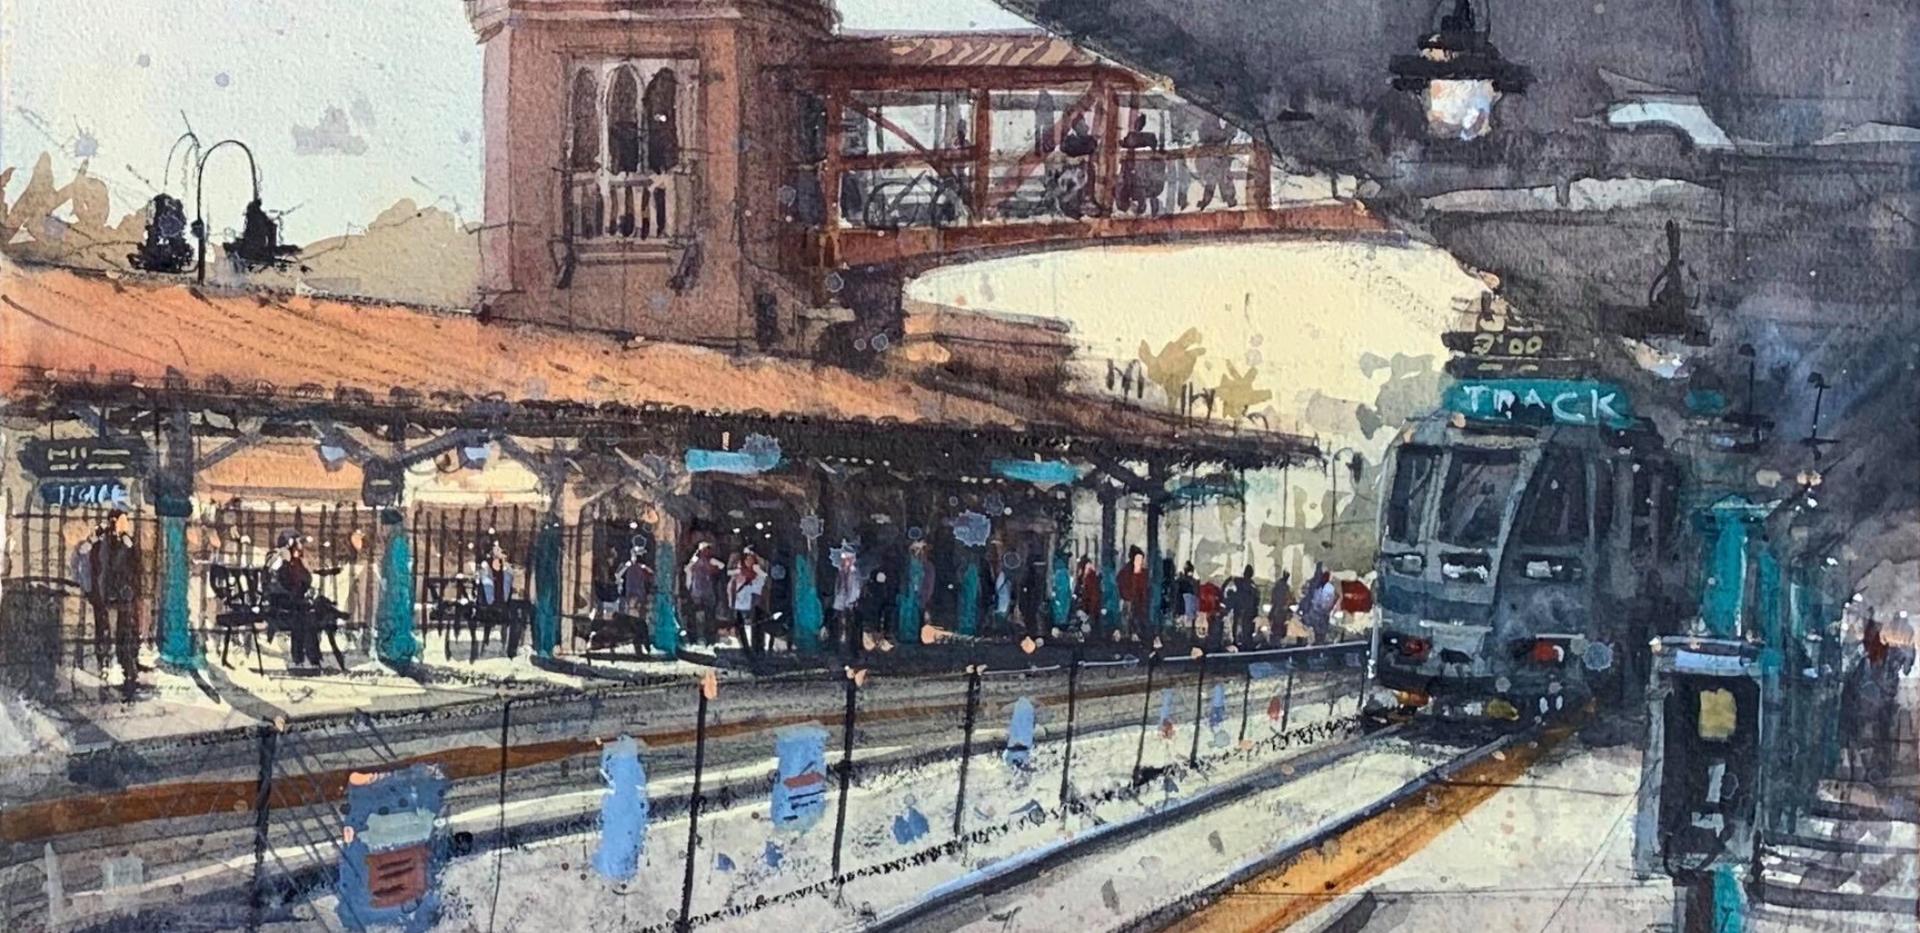 West Palm South Train Depot